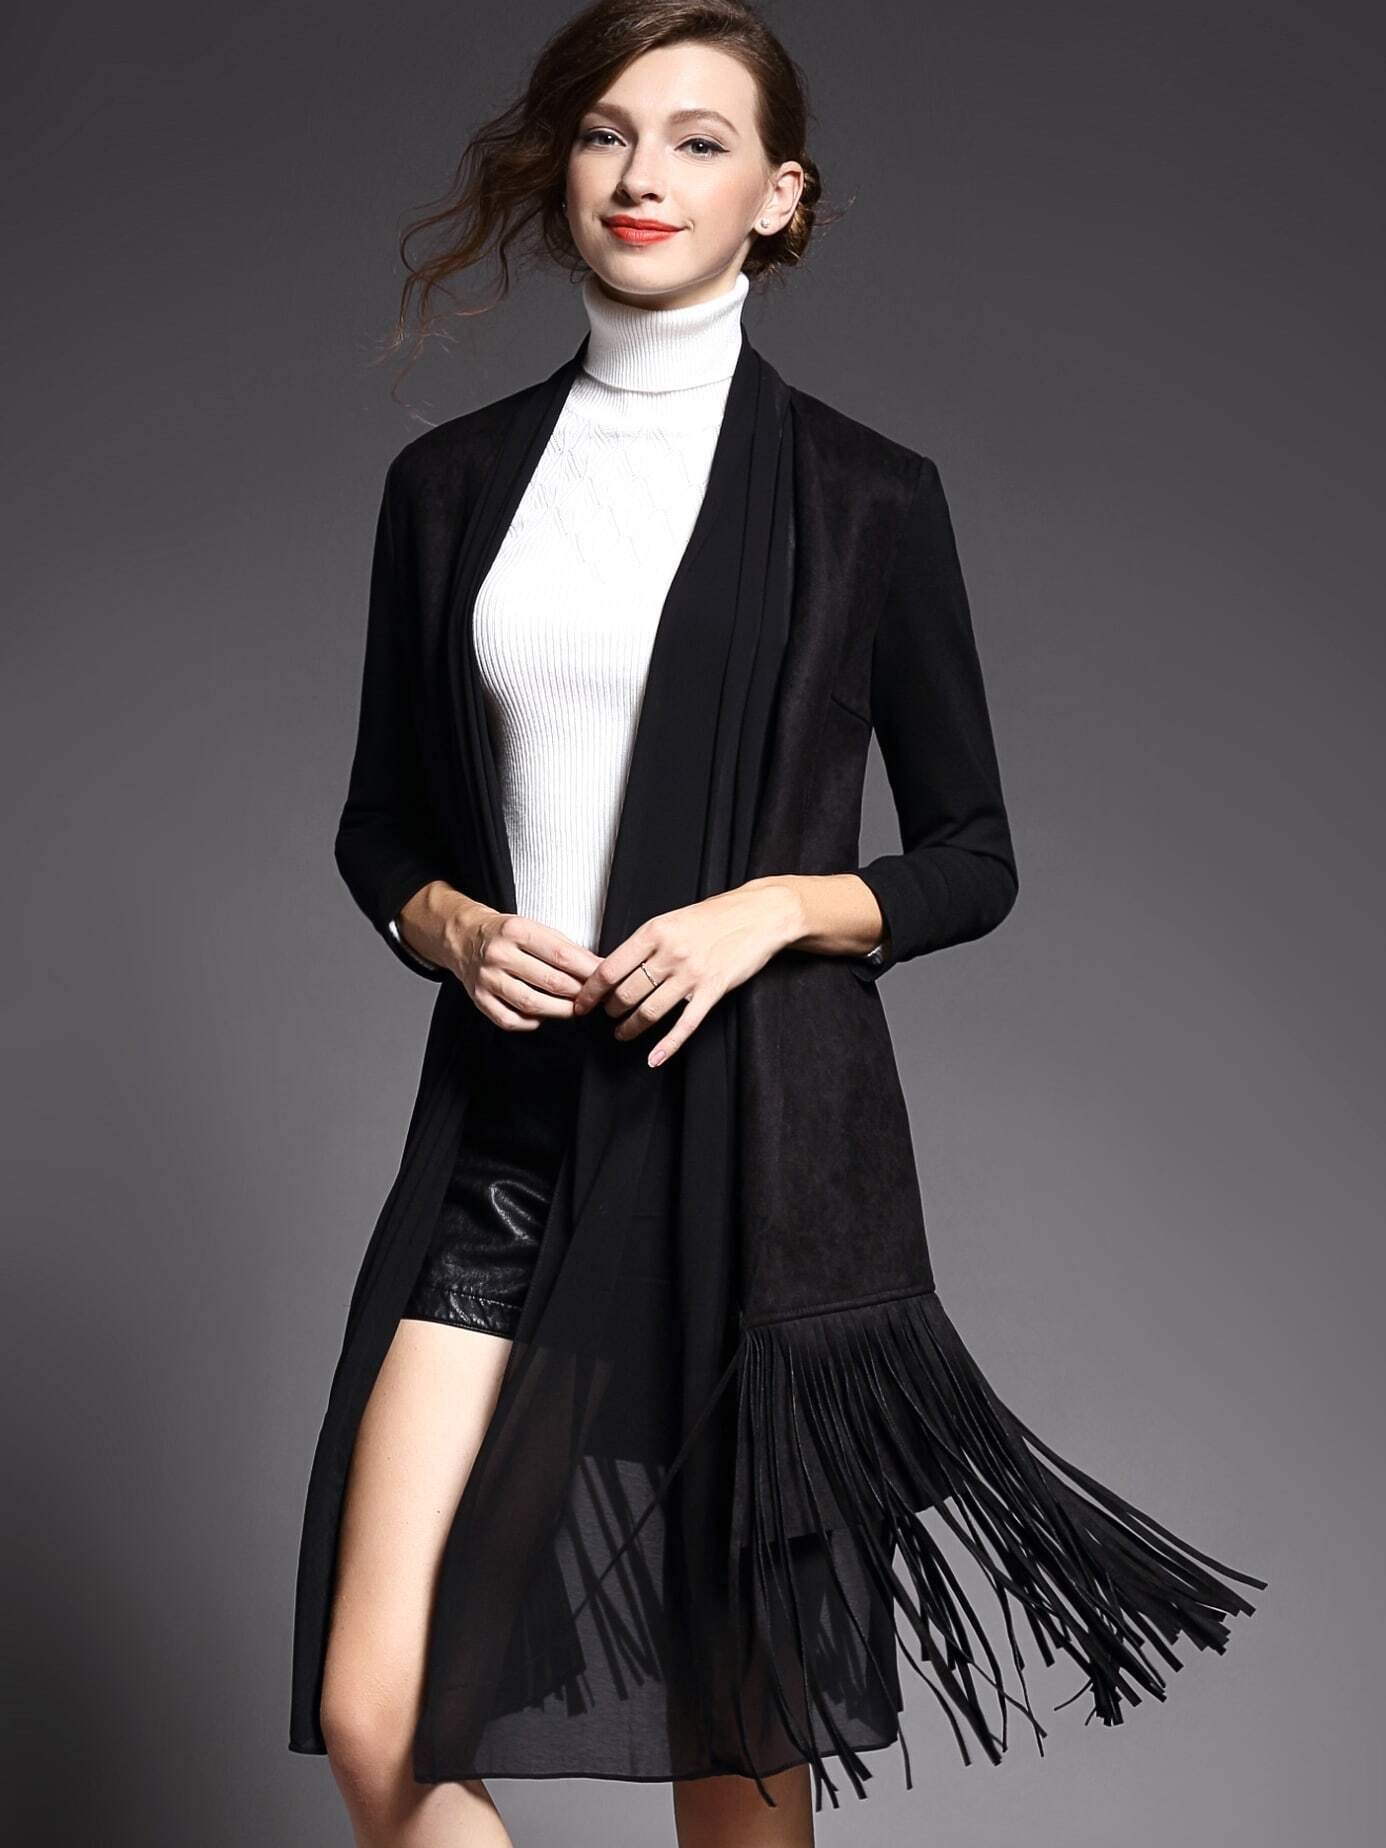 Black Long Sleeve Contrast Gauze Tassel Pockets Coat